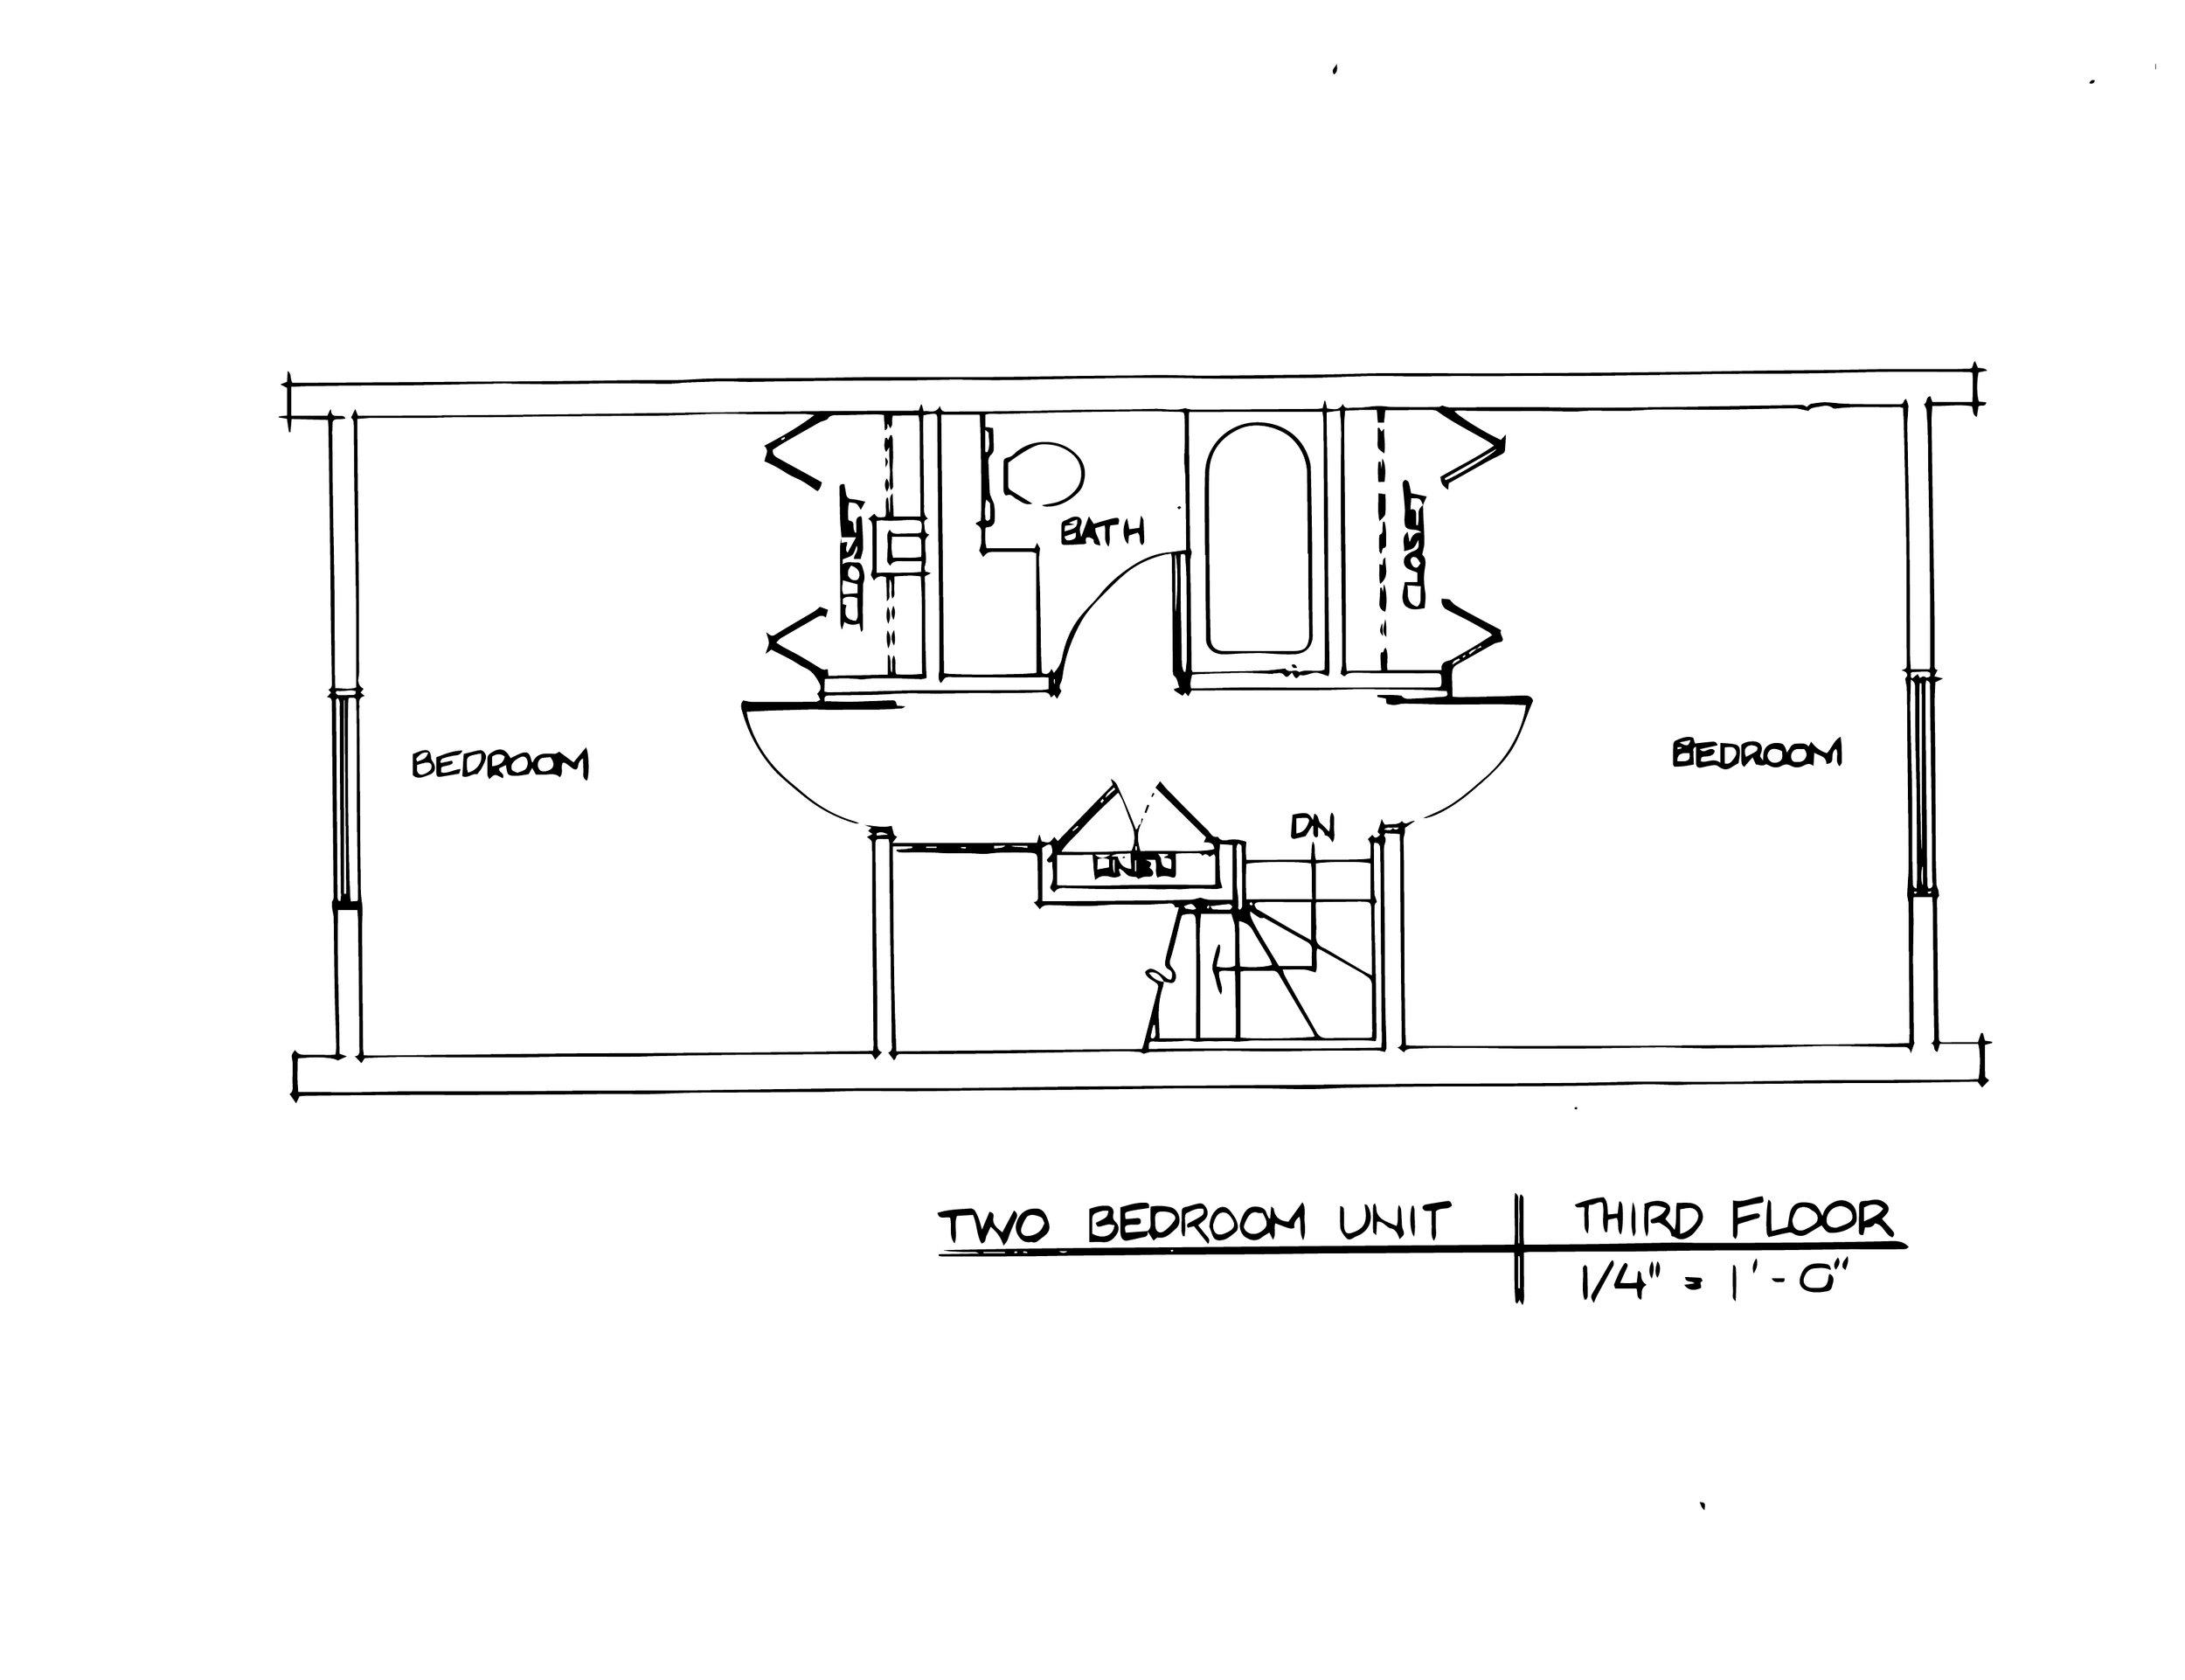 2 bdrm. third floor (edited).jpg